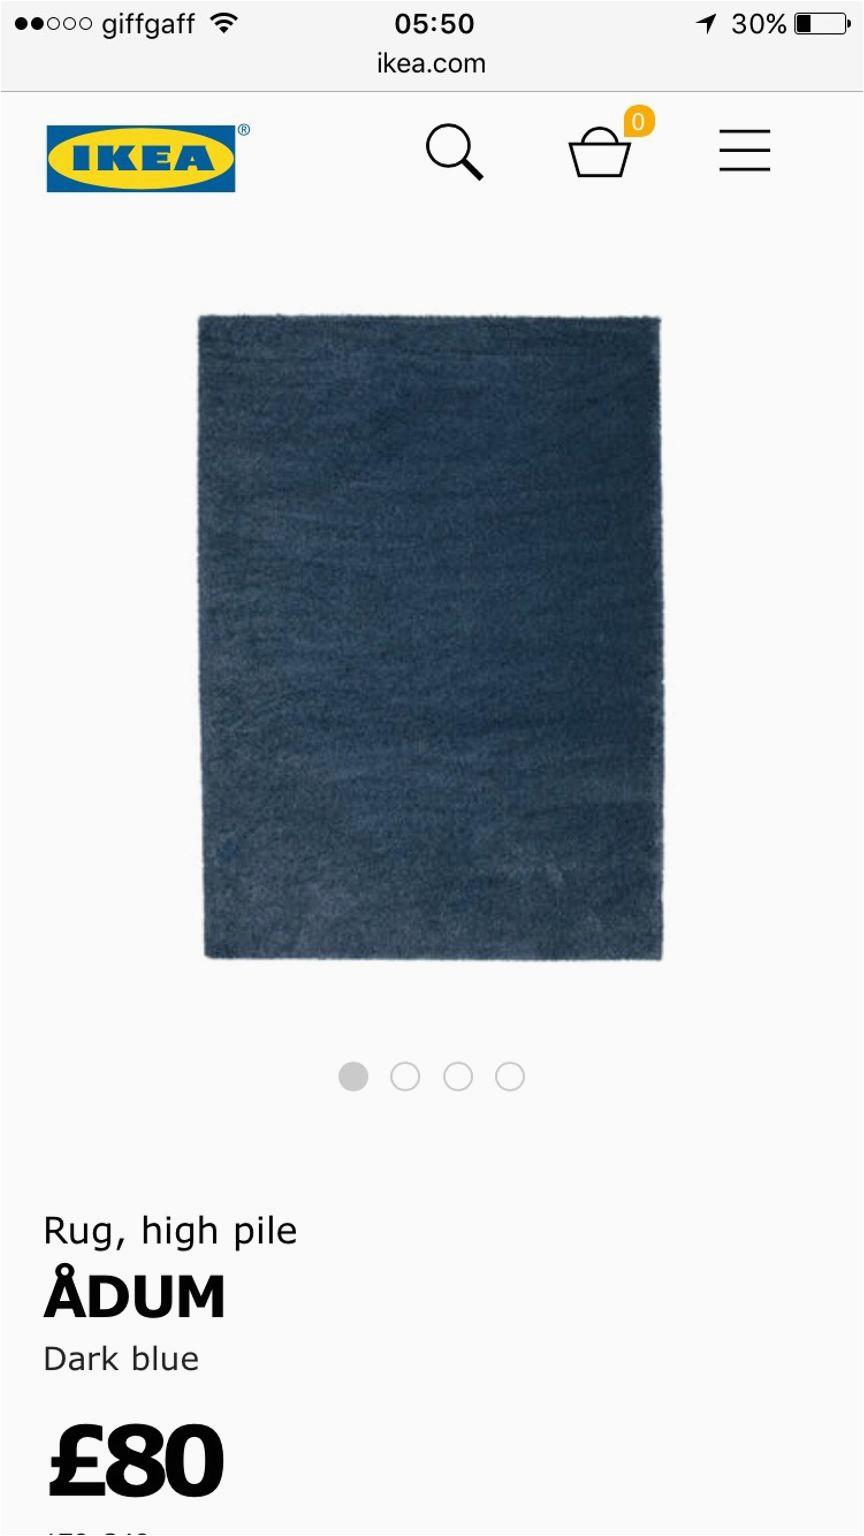 ikea adum rug dark blue 133x195cm